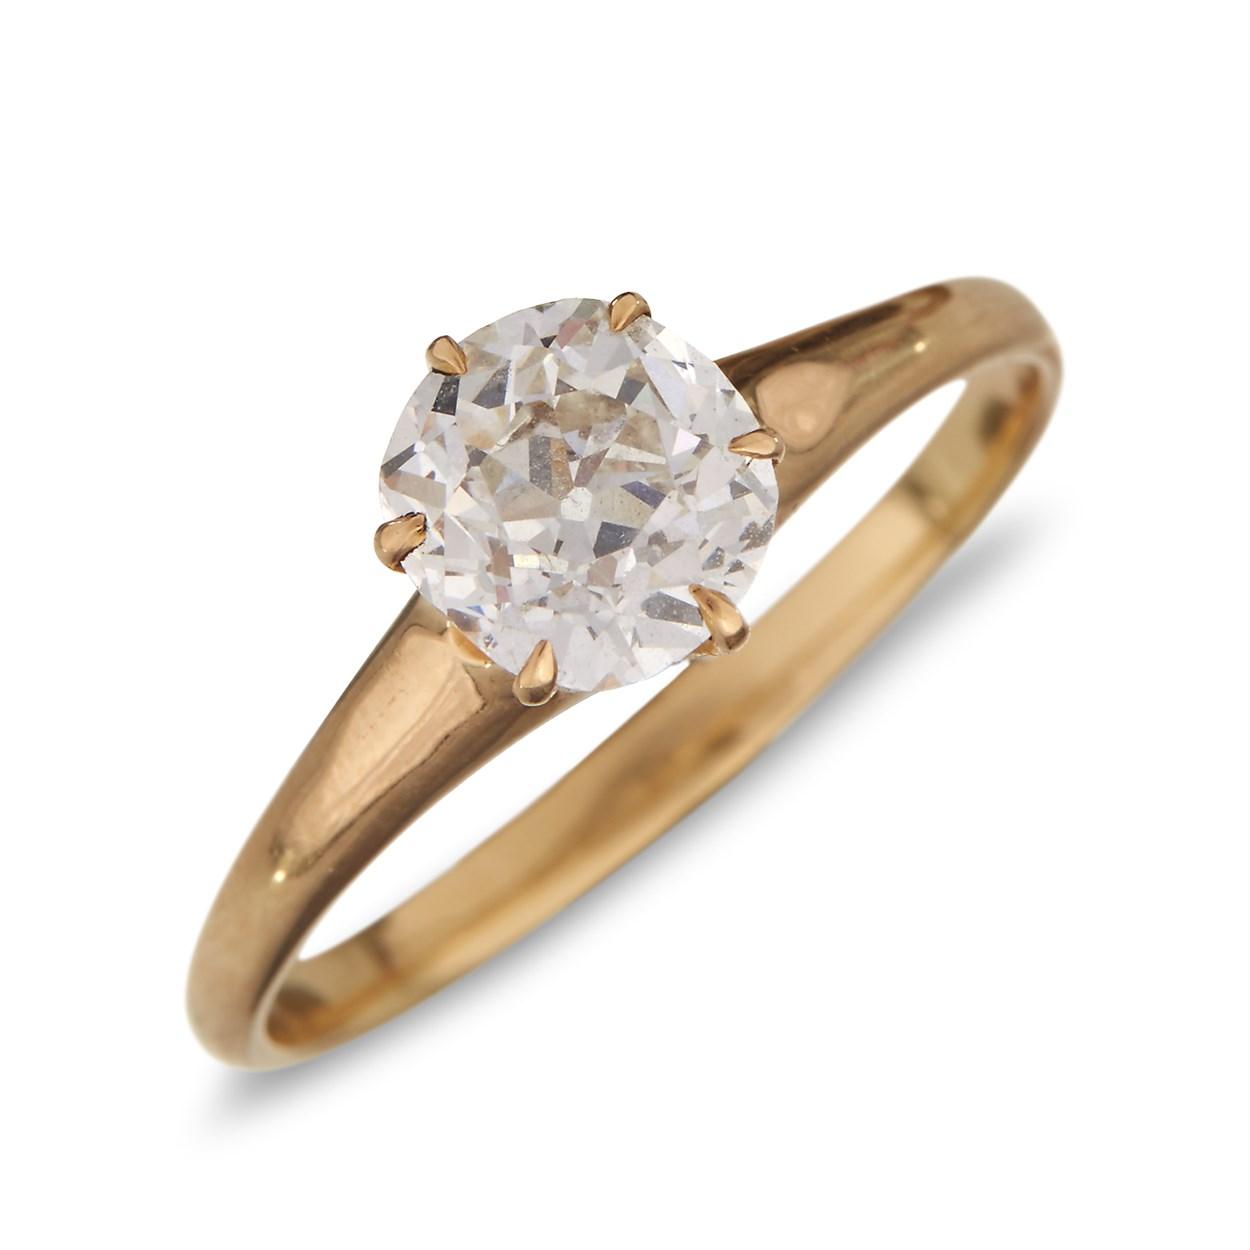 Lot 21 - A diamond solitaire